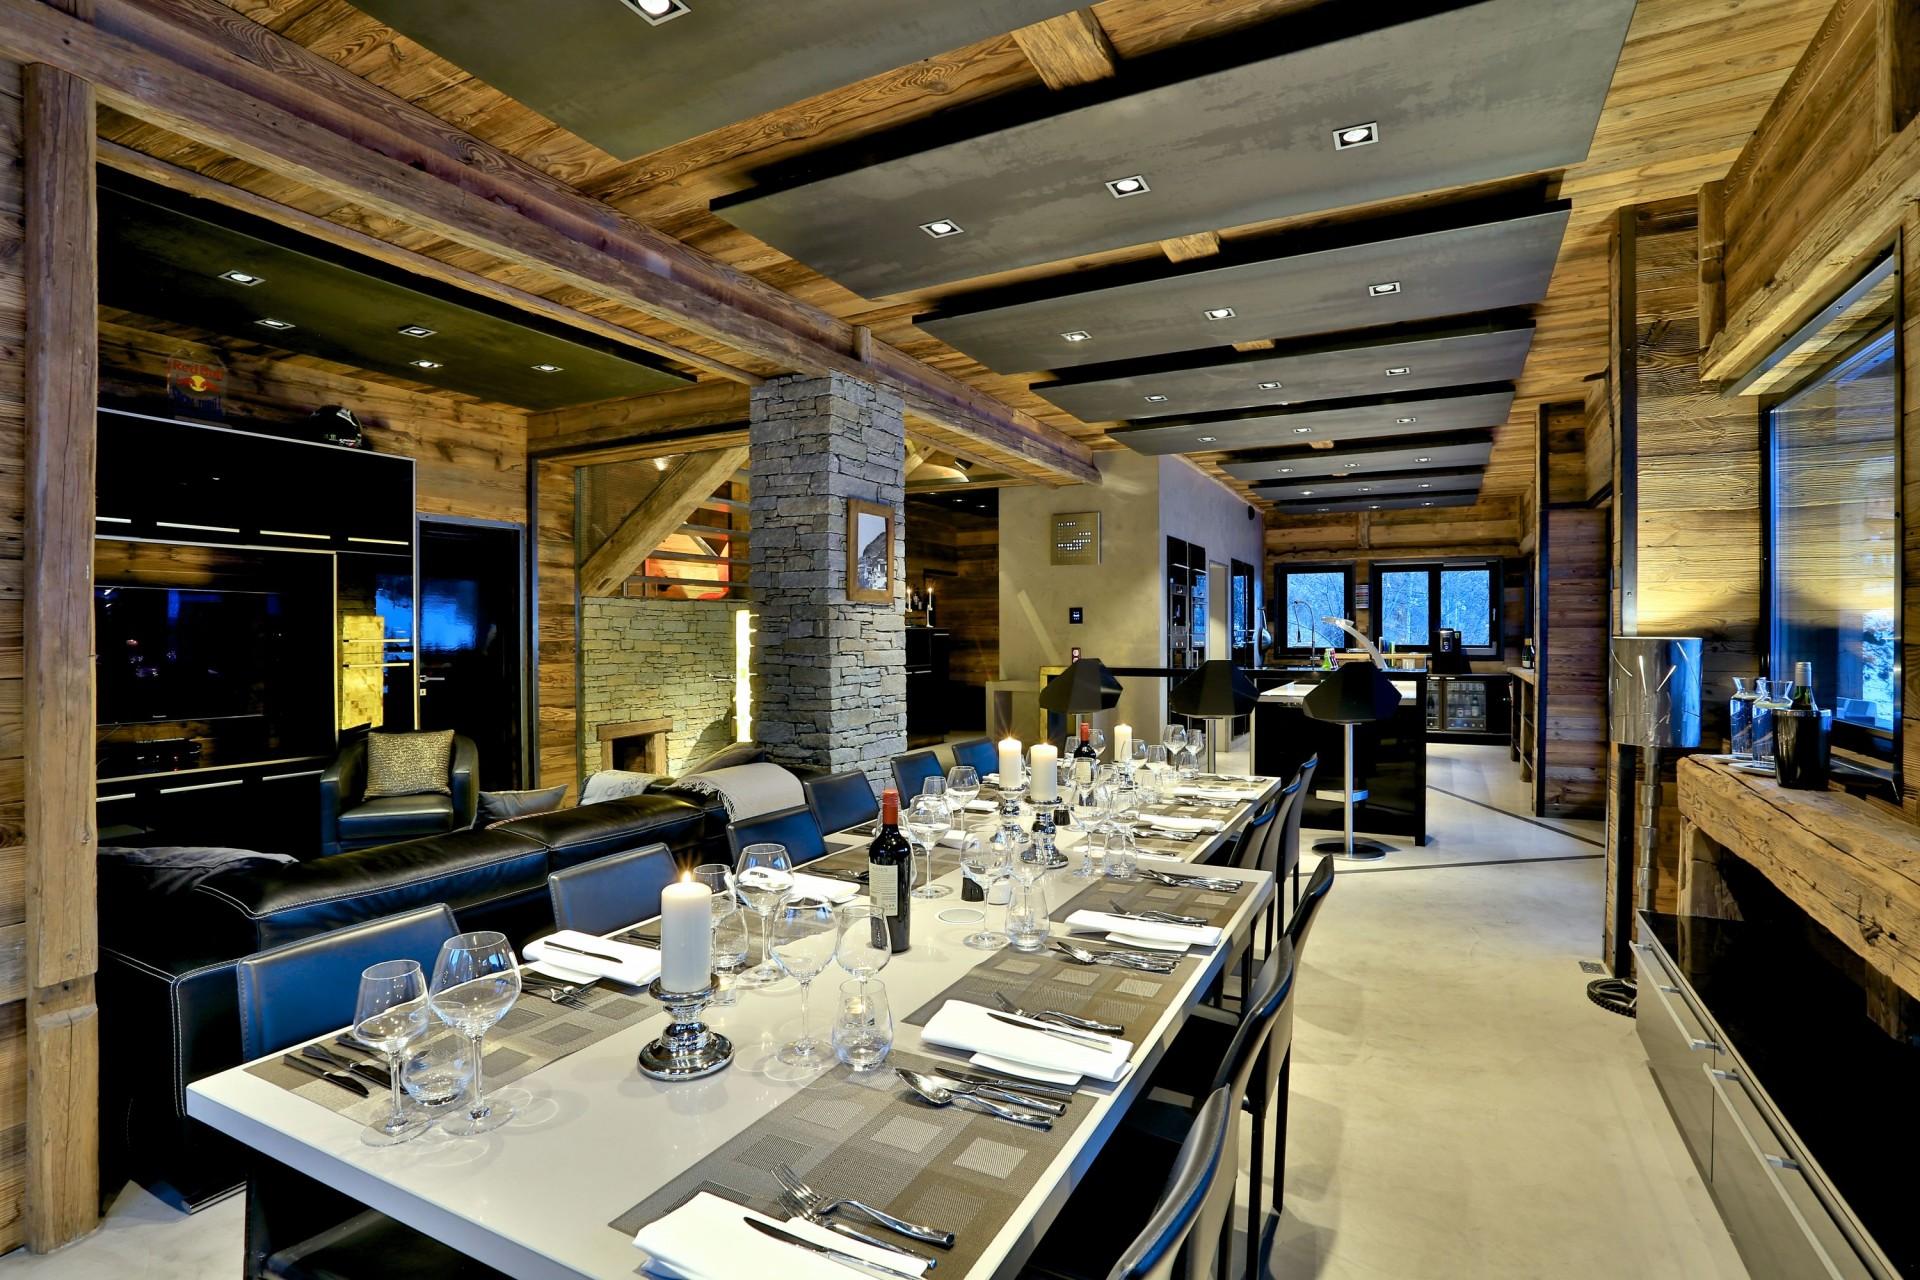 Tignes Location Chalet Luxe Tirodite Table Manger